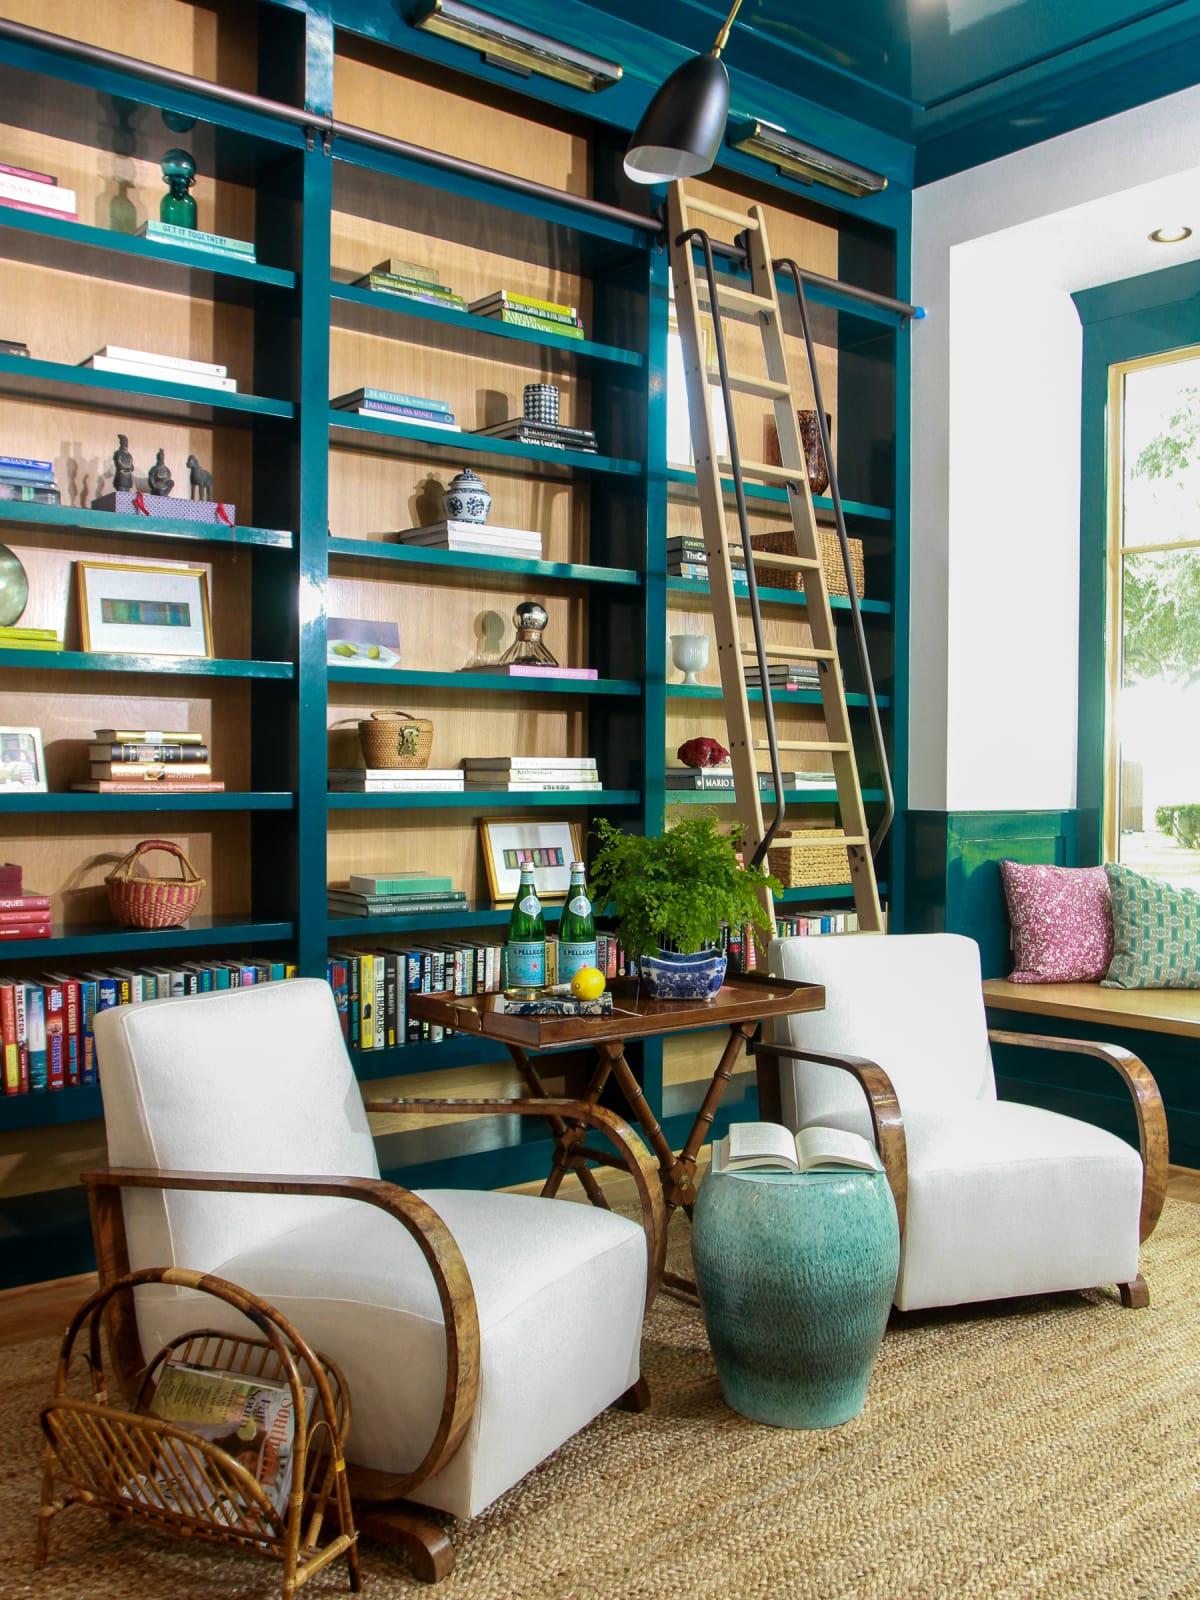 Braes Southern Living Showcase Home barbara bush interior library